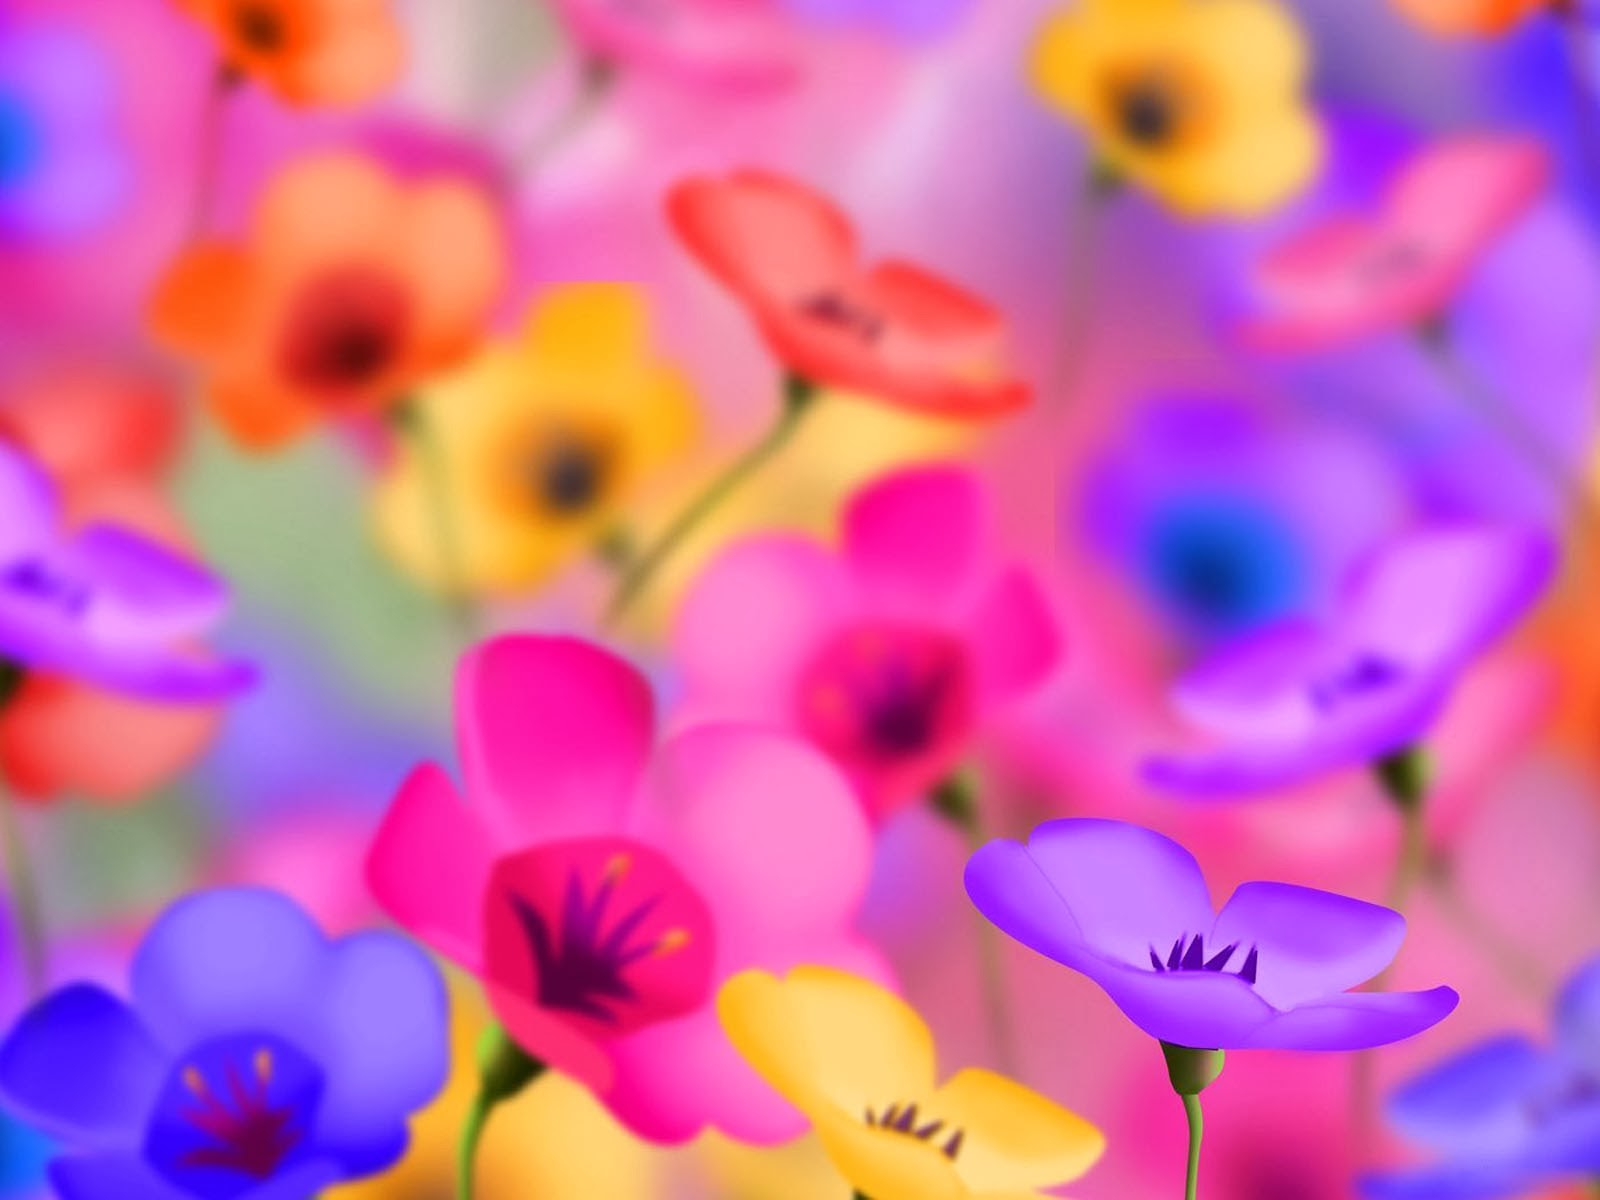 Flowers wallpapers desktop sf wallpaper 50 beautiful flower wallpaper images for download izmirmasajfo